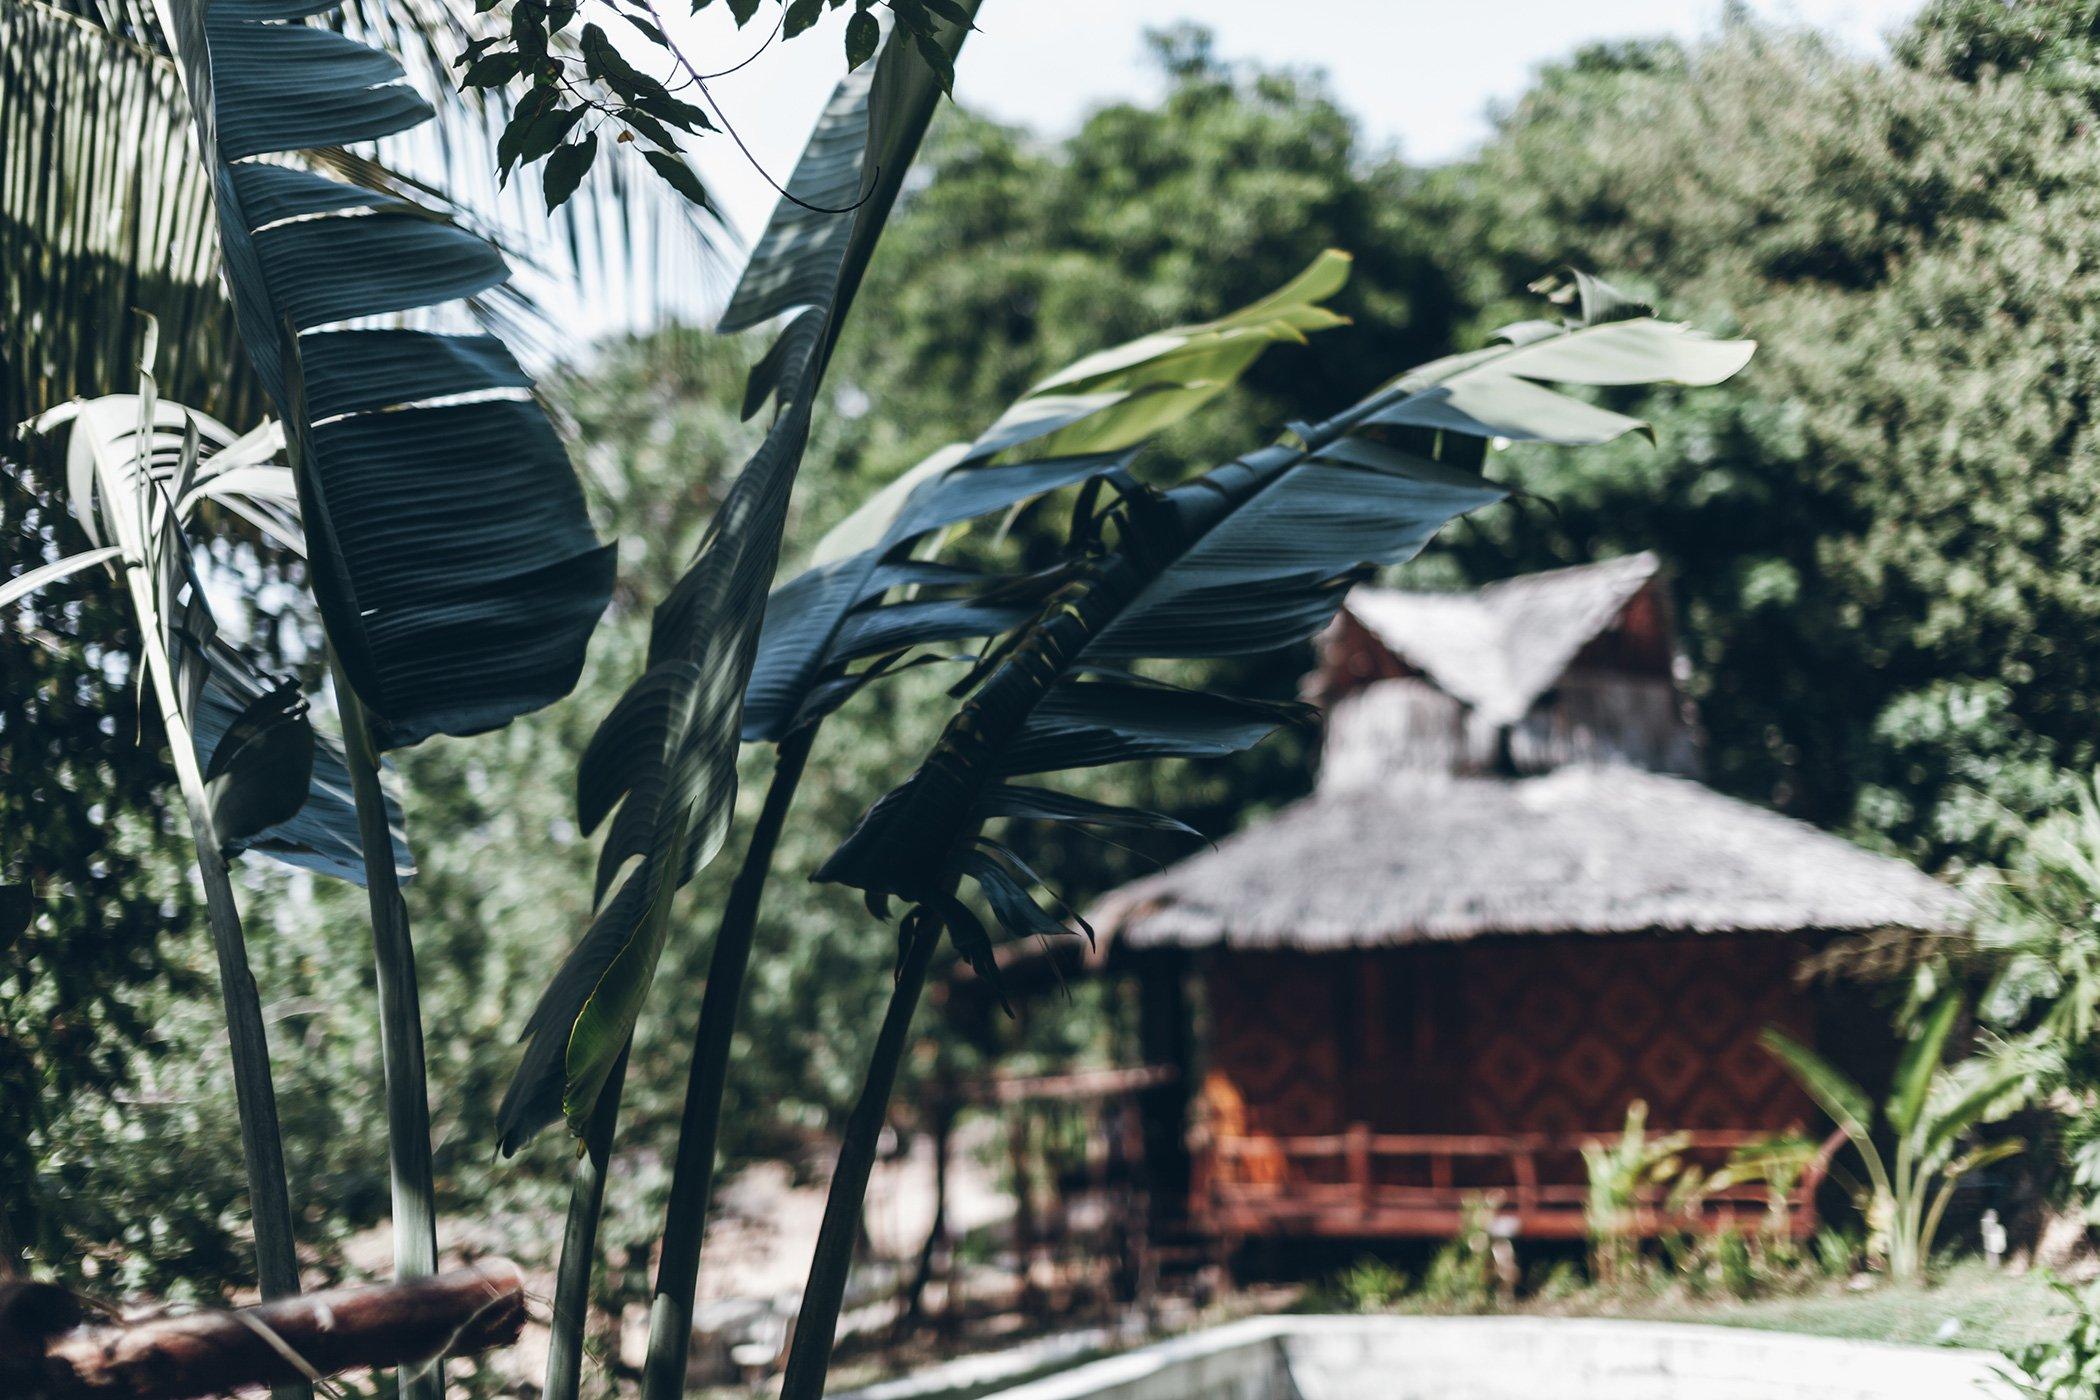 mikuta-koh-jum-thailand-11